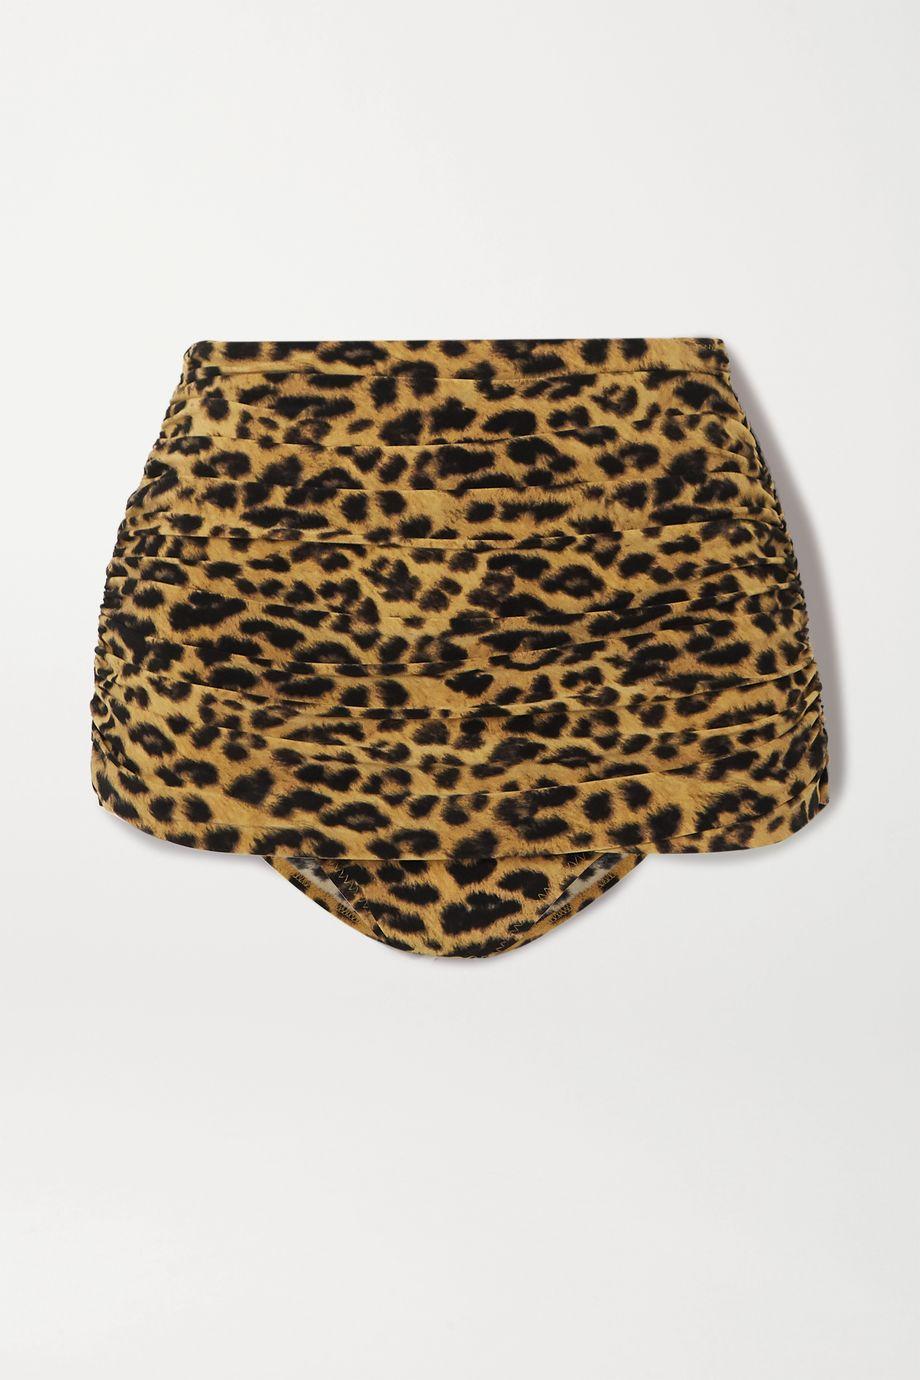 Norma Kamali Culotte de bikini à fronces et à imprimé léopard Bill